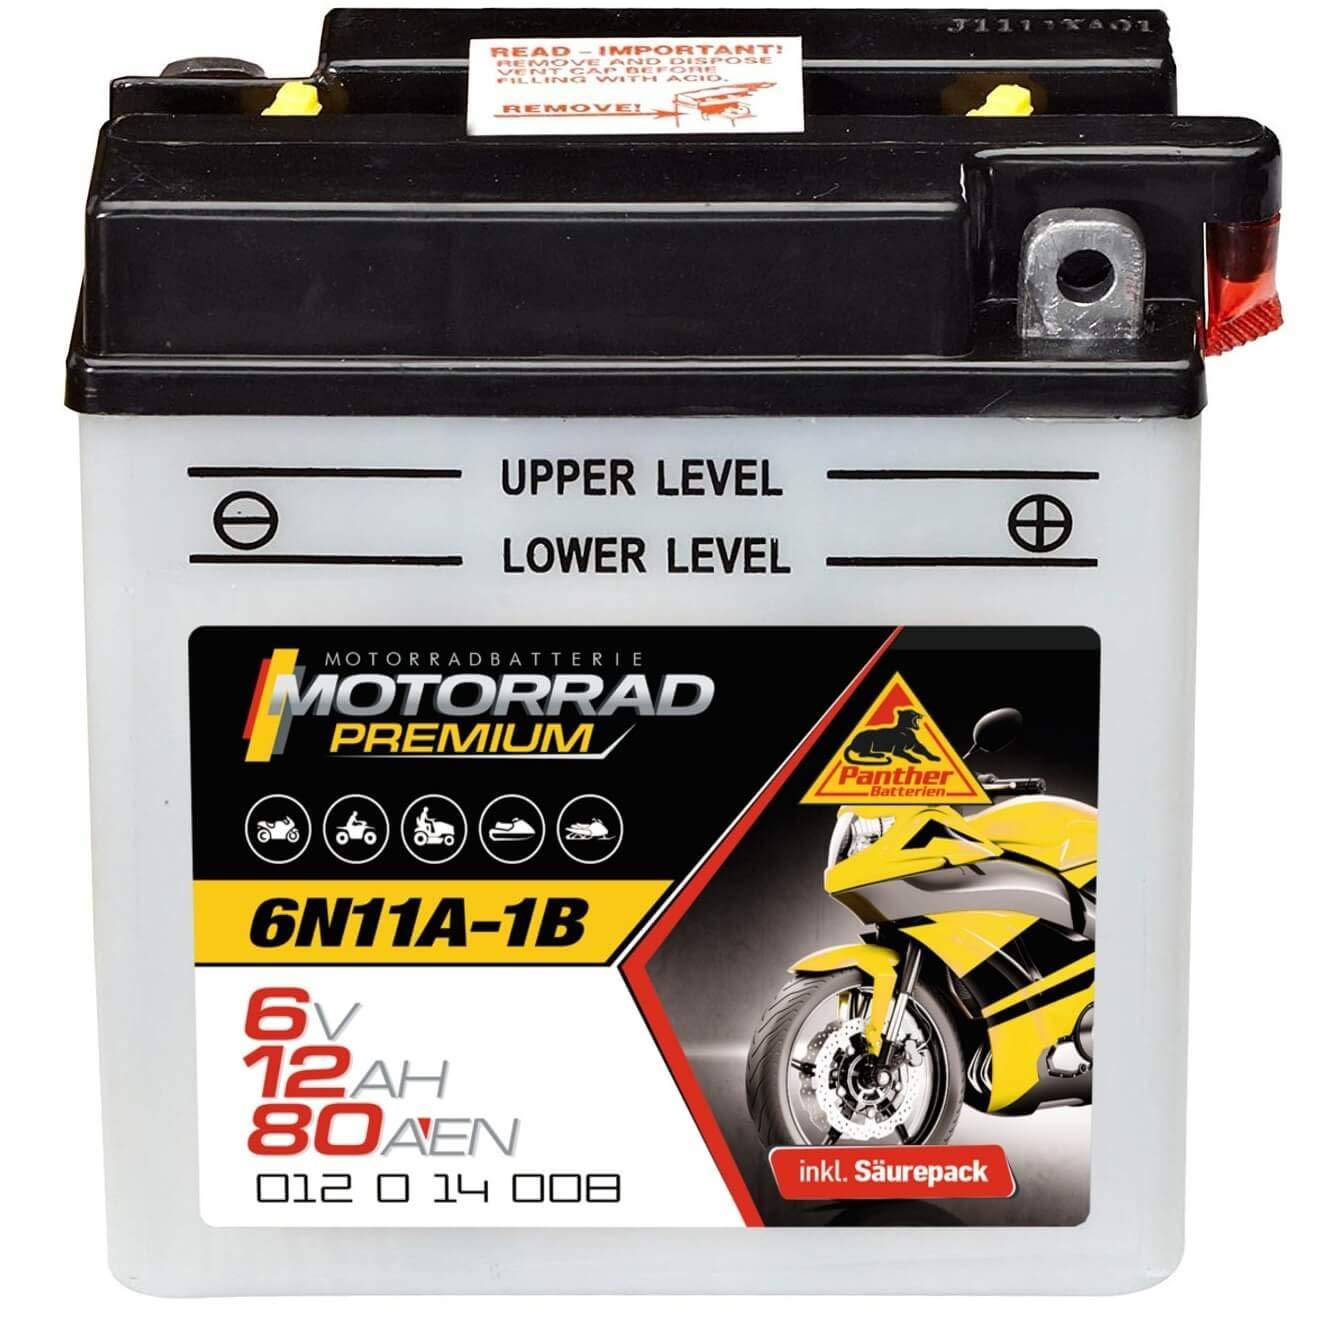 01214 Motorradbatterie Oldtimer Batterie 80 A//EN Panther 6N11A-1B 6 V // 12 Ah